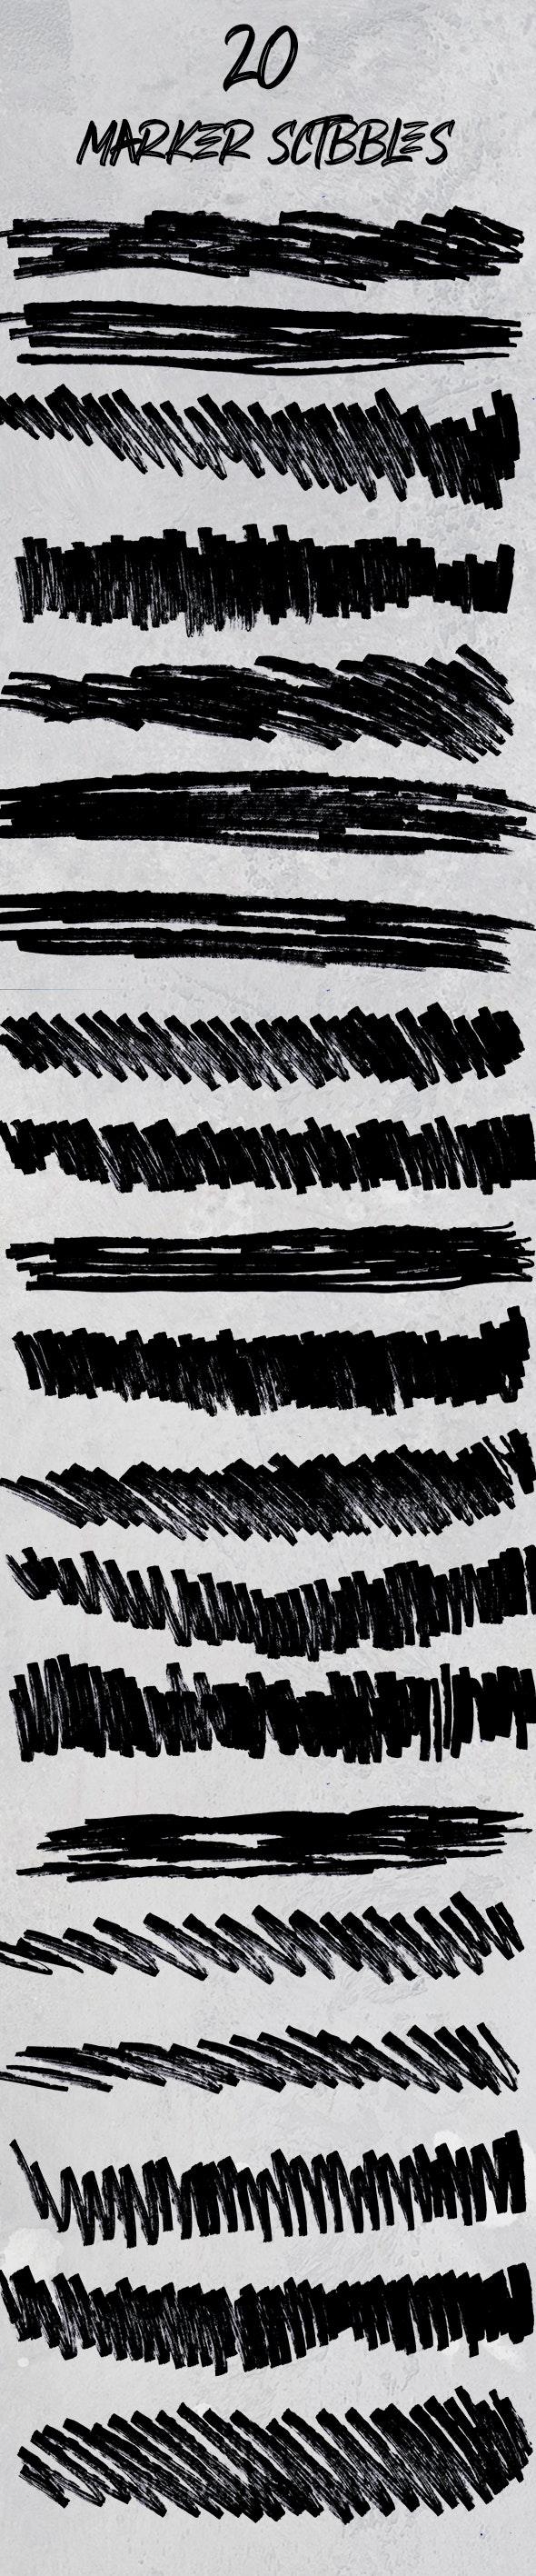 20 Maker Scribbles - Artistic Brushes